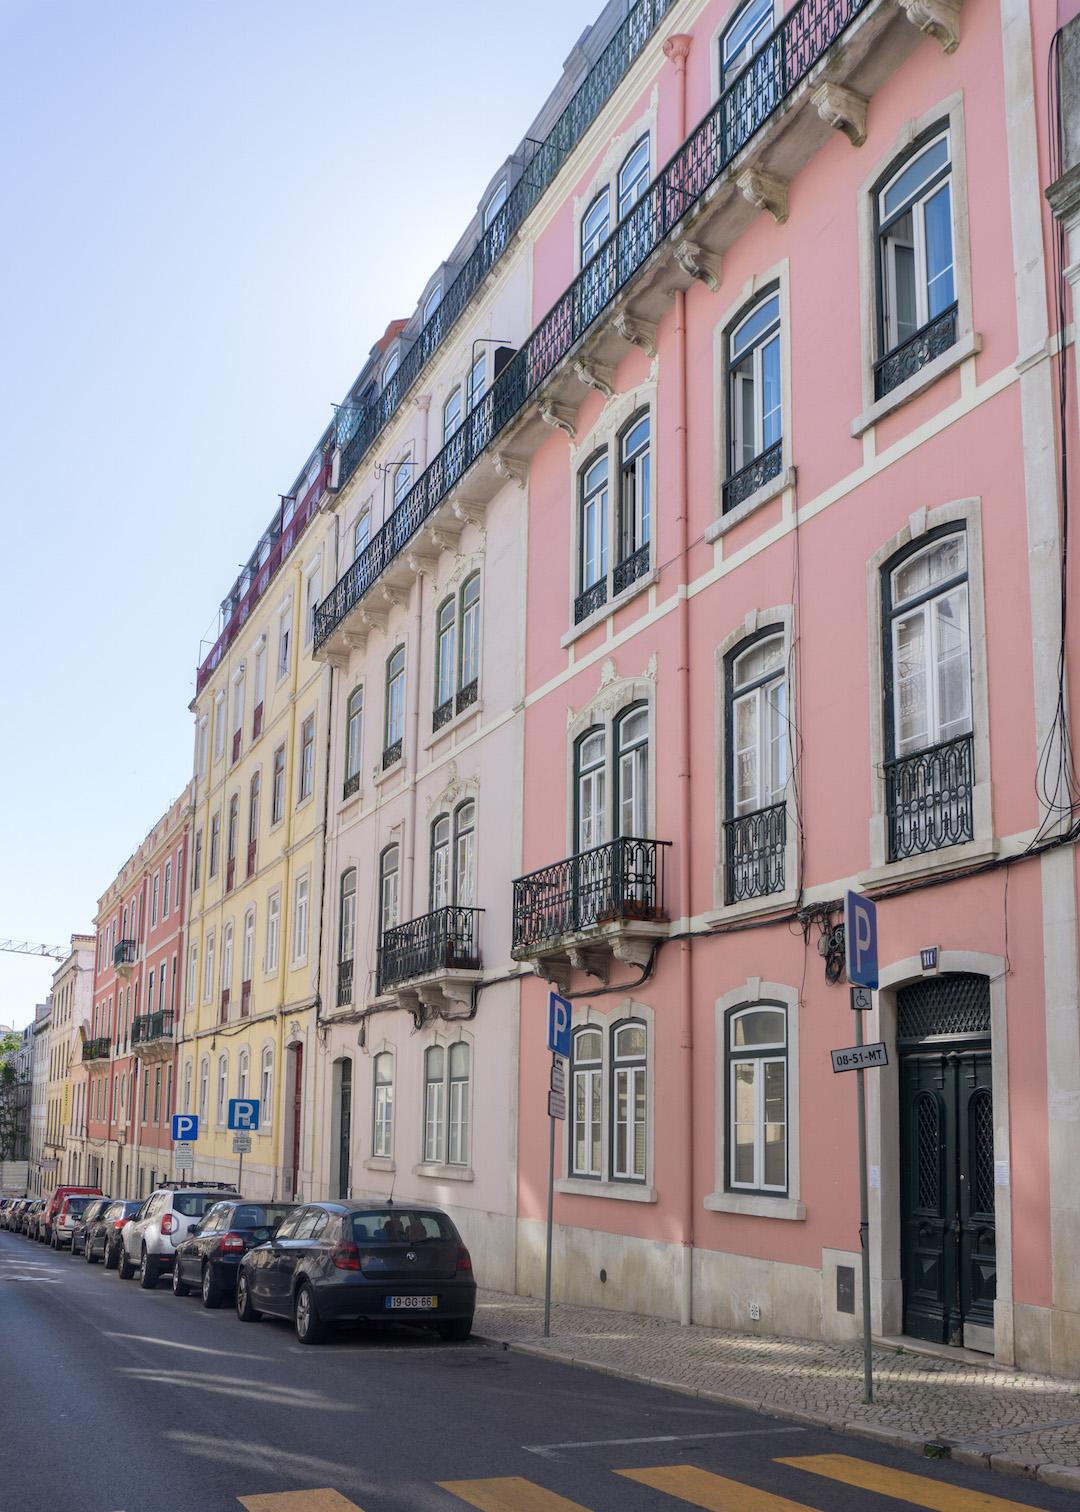 Her_Travel_Edit_Lisbon_Pastel_Houses